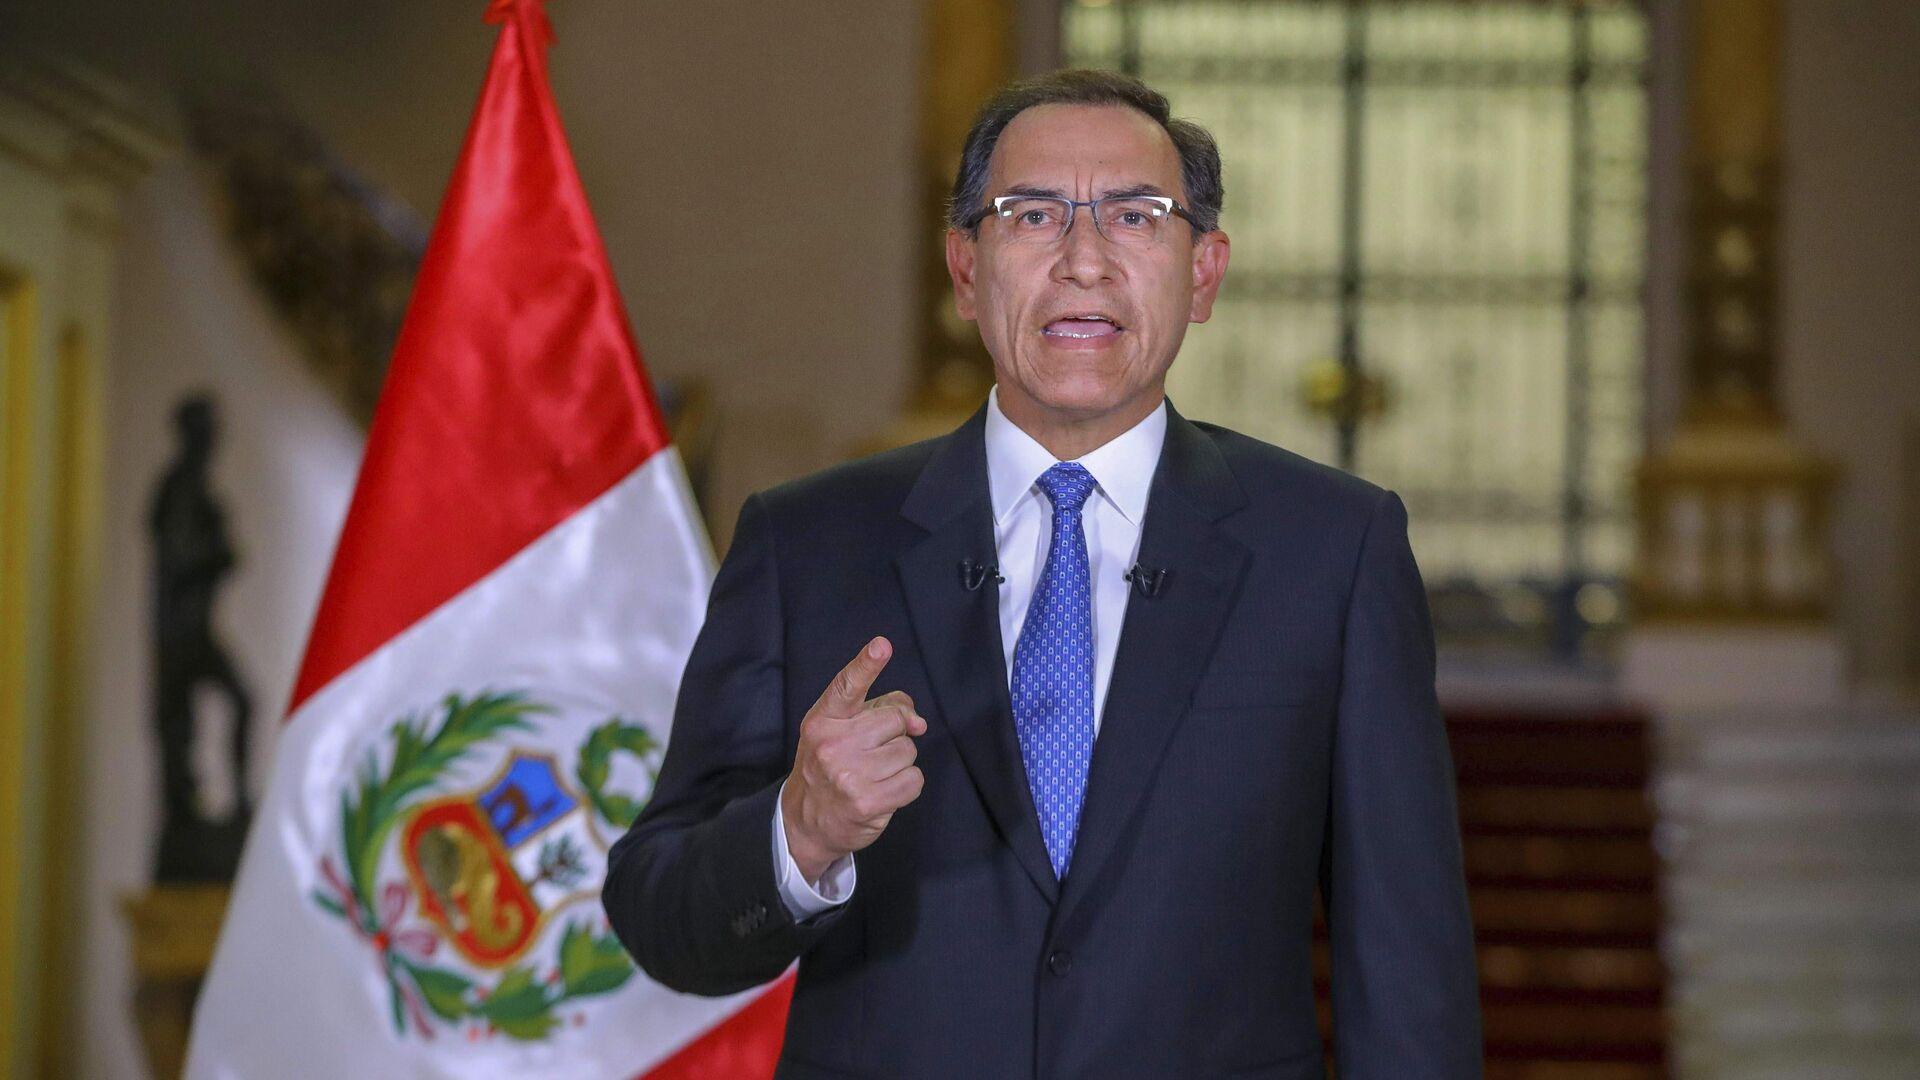 Martín Vizcarra, expresidente de Perú - Sputnik Mundo, 1920, 23.02.2021